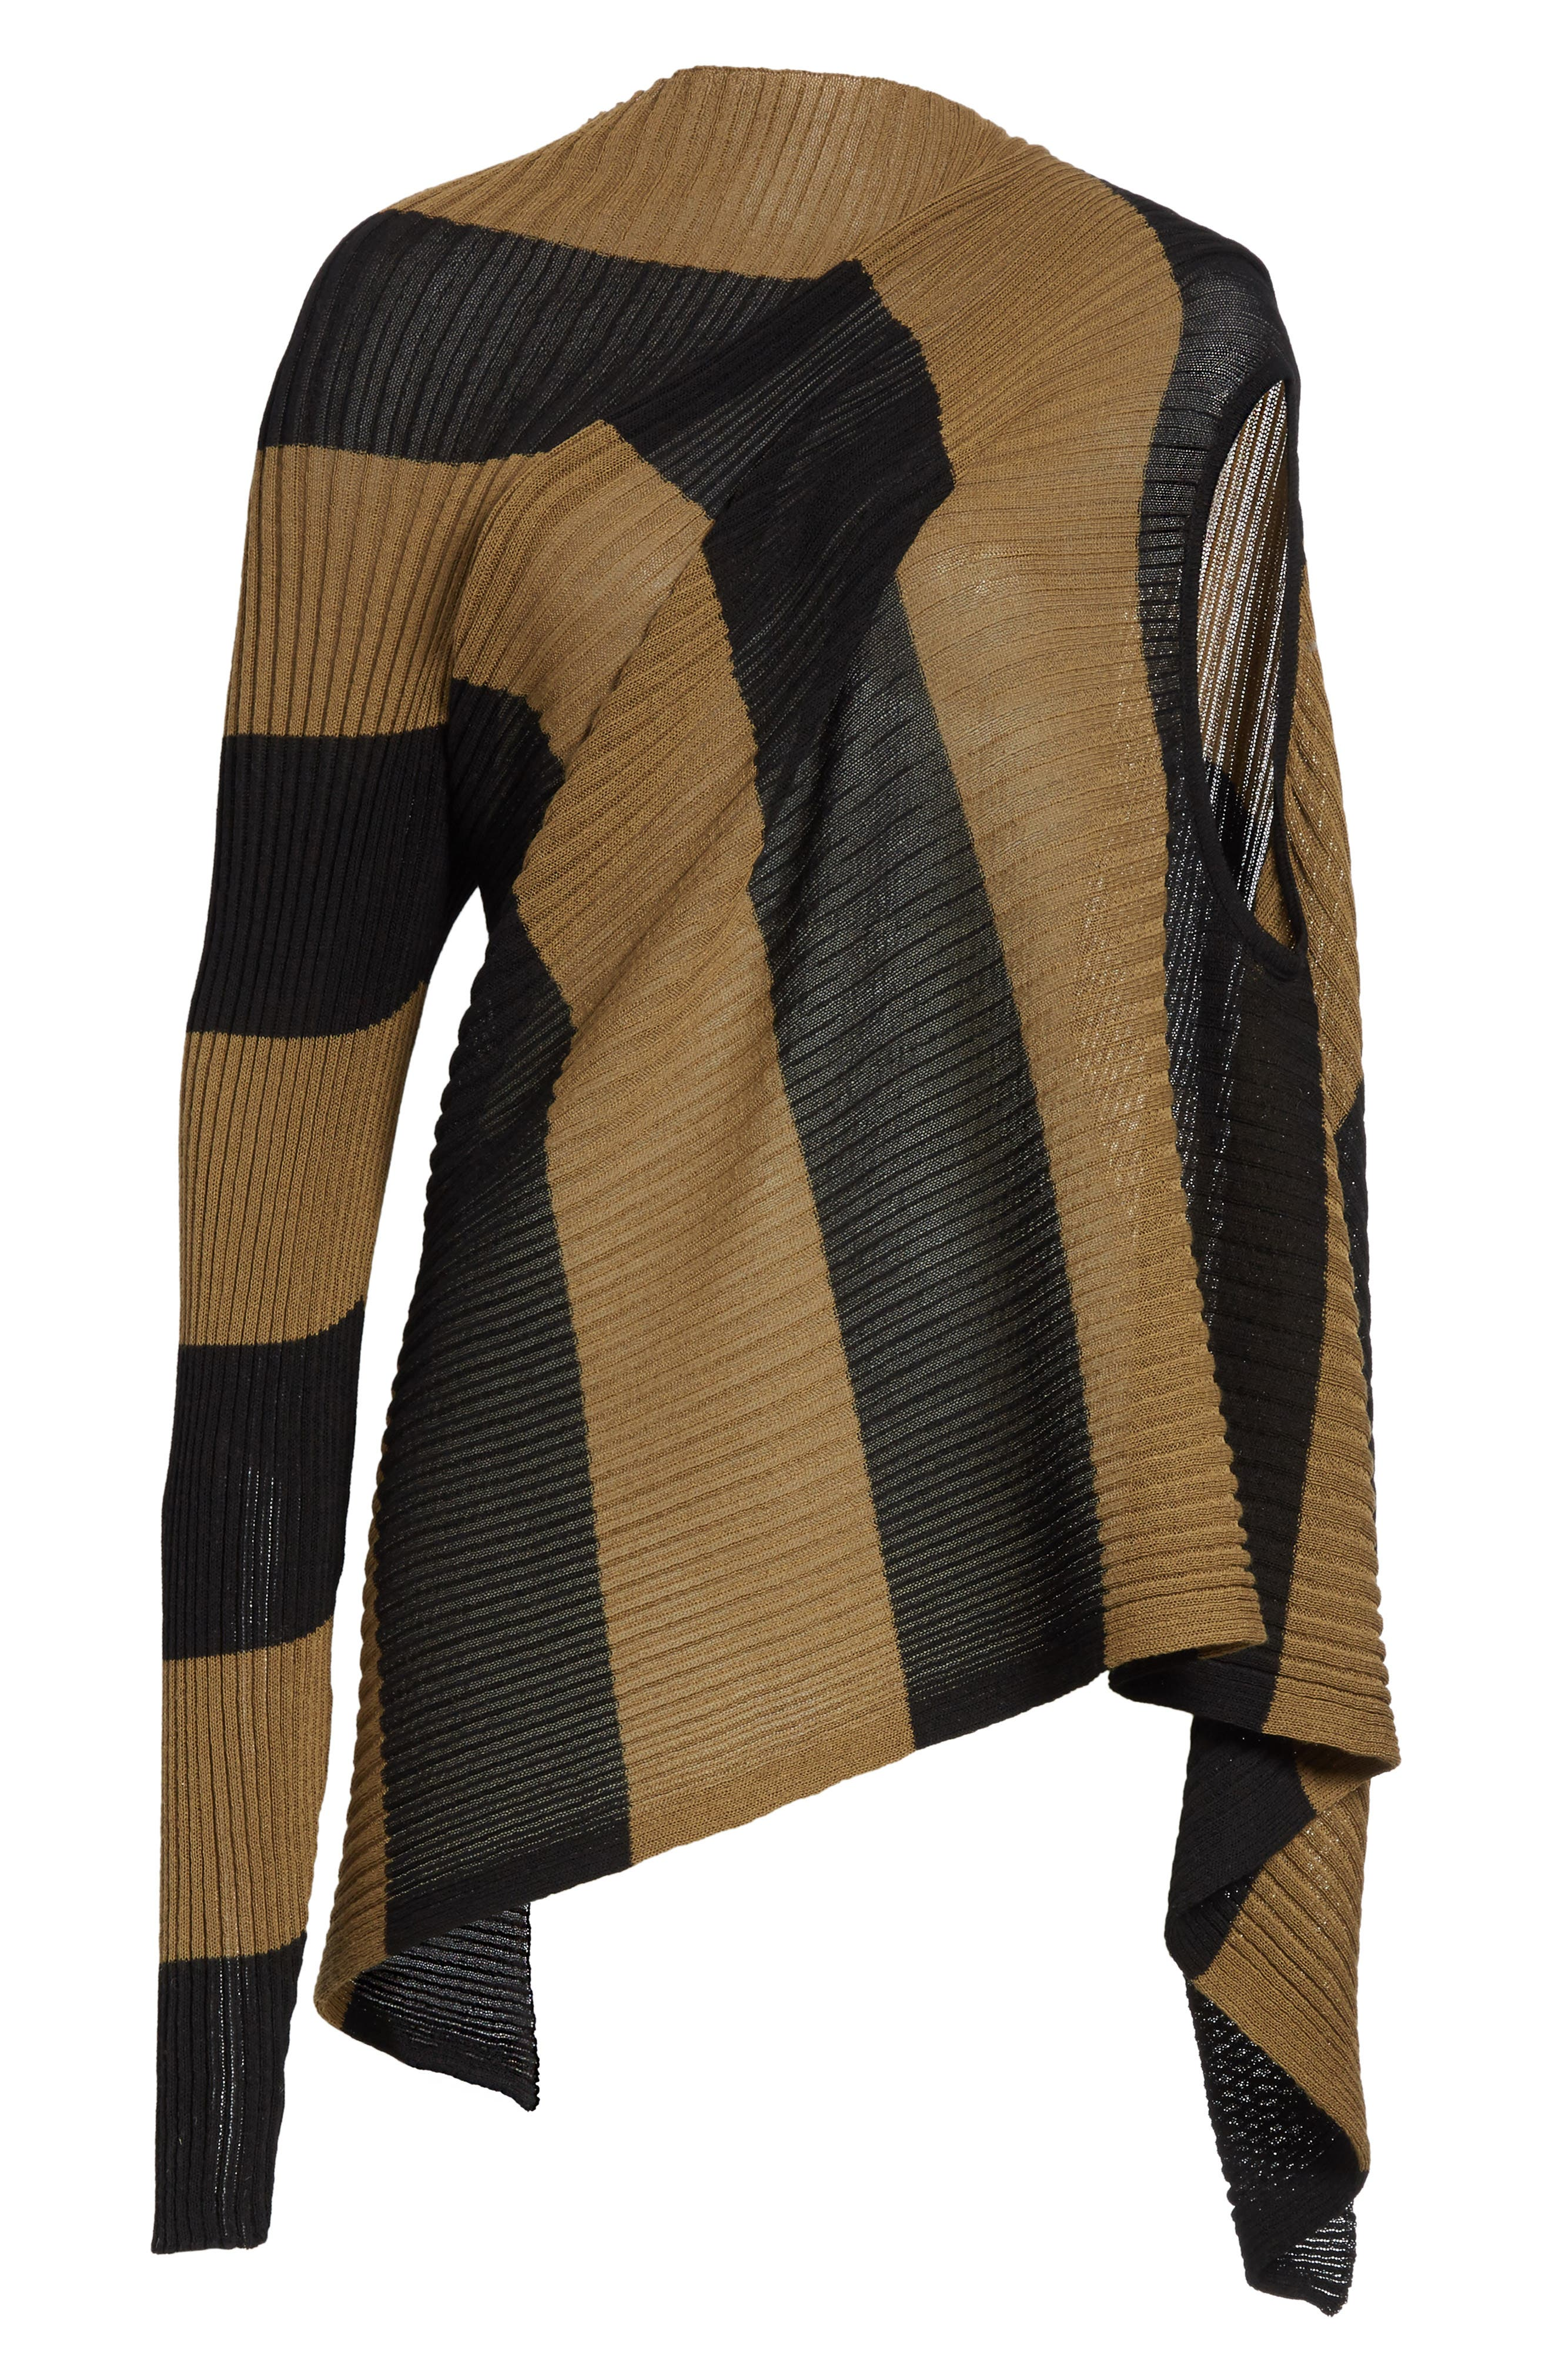 Marques'Almeida Draped One Sleeve Sweater,                             Alternate thumbnail 7, color,                             Khaki/ Black